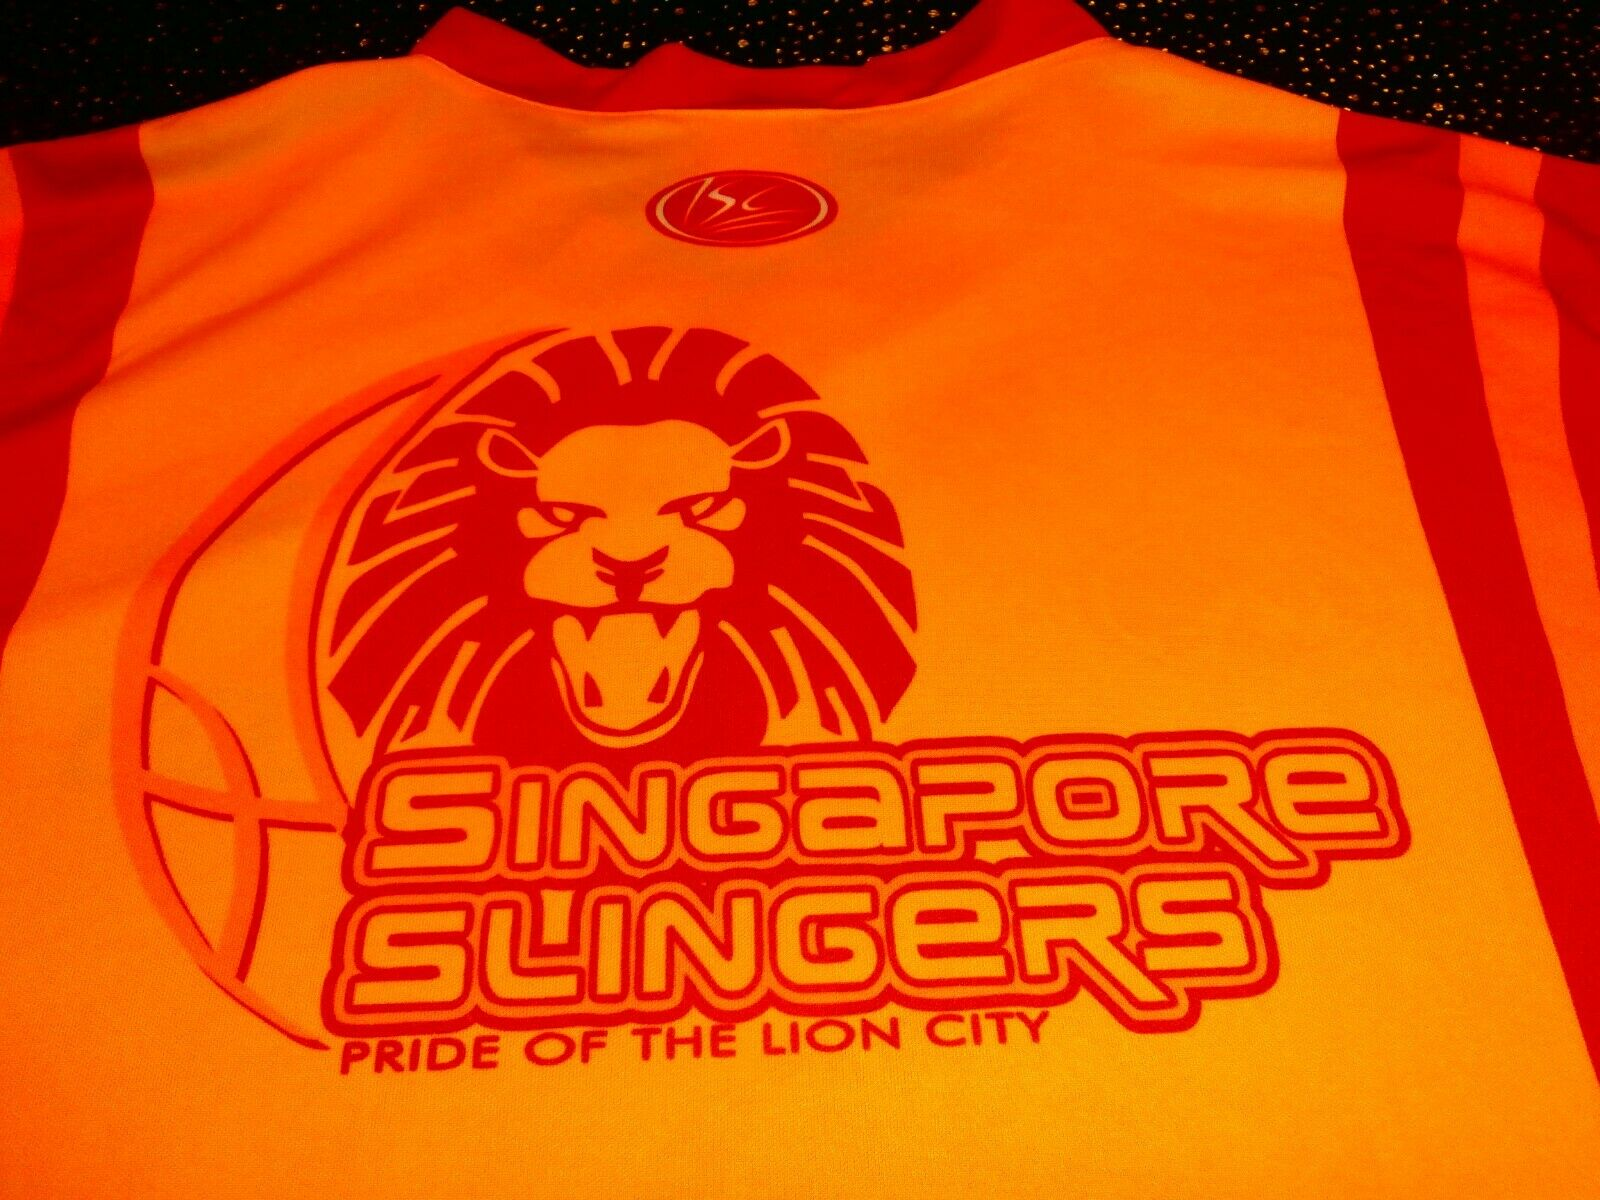 SINGAPORE SLINGERS NBL Basketball Jersey Shirt MENS XL VINTAGE RARE MADE IN OZ